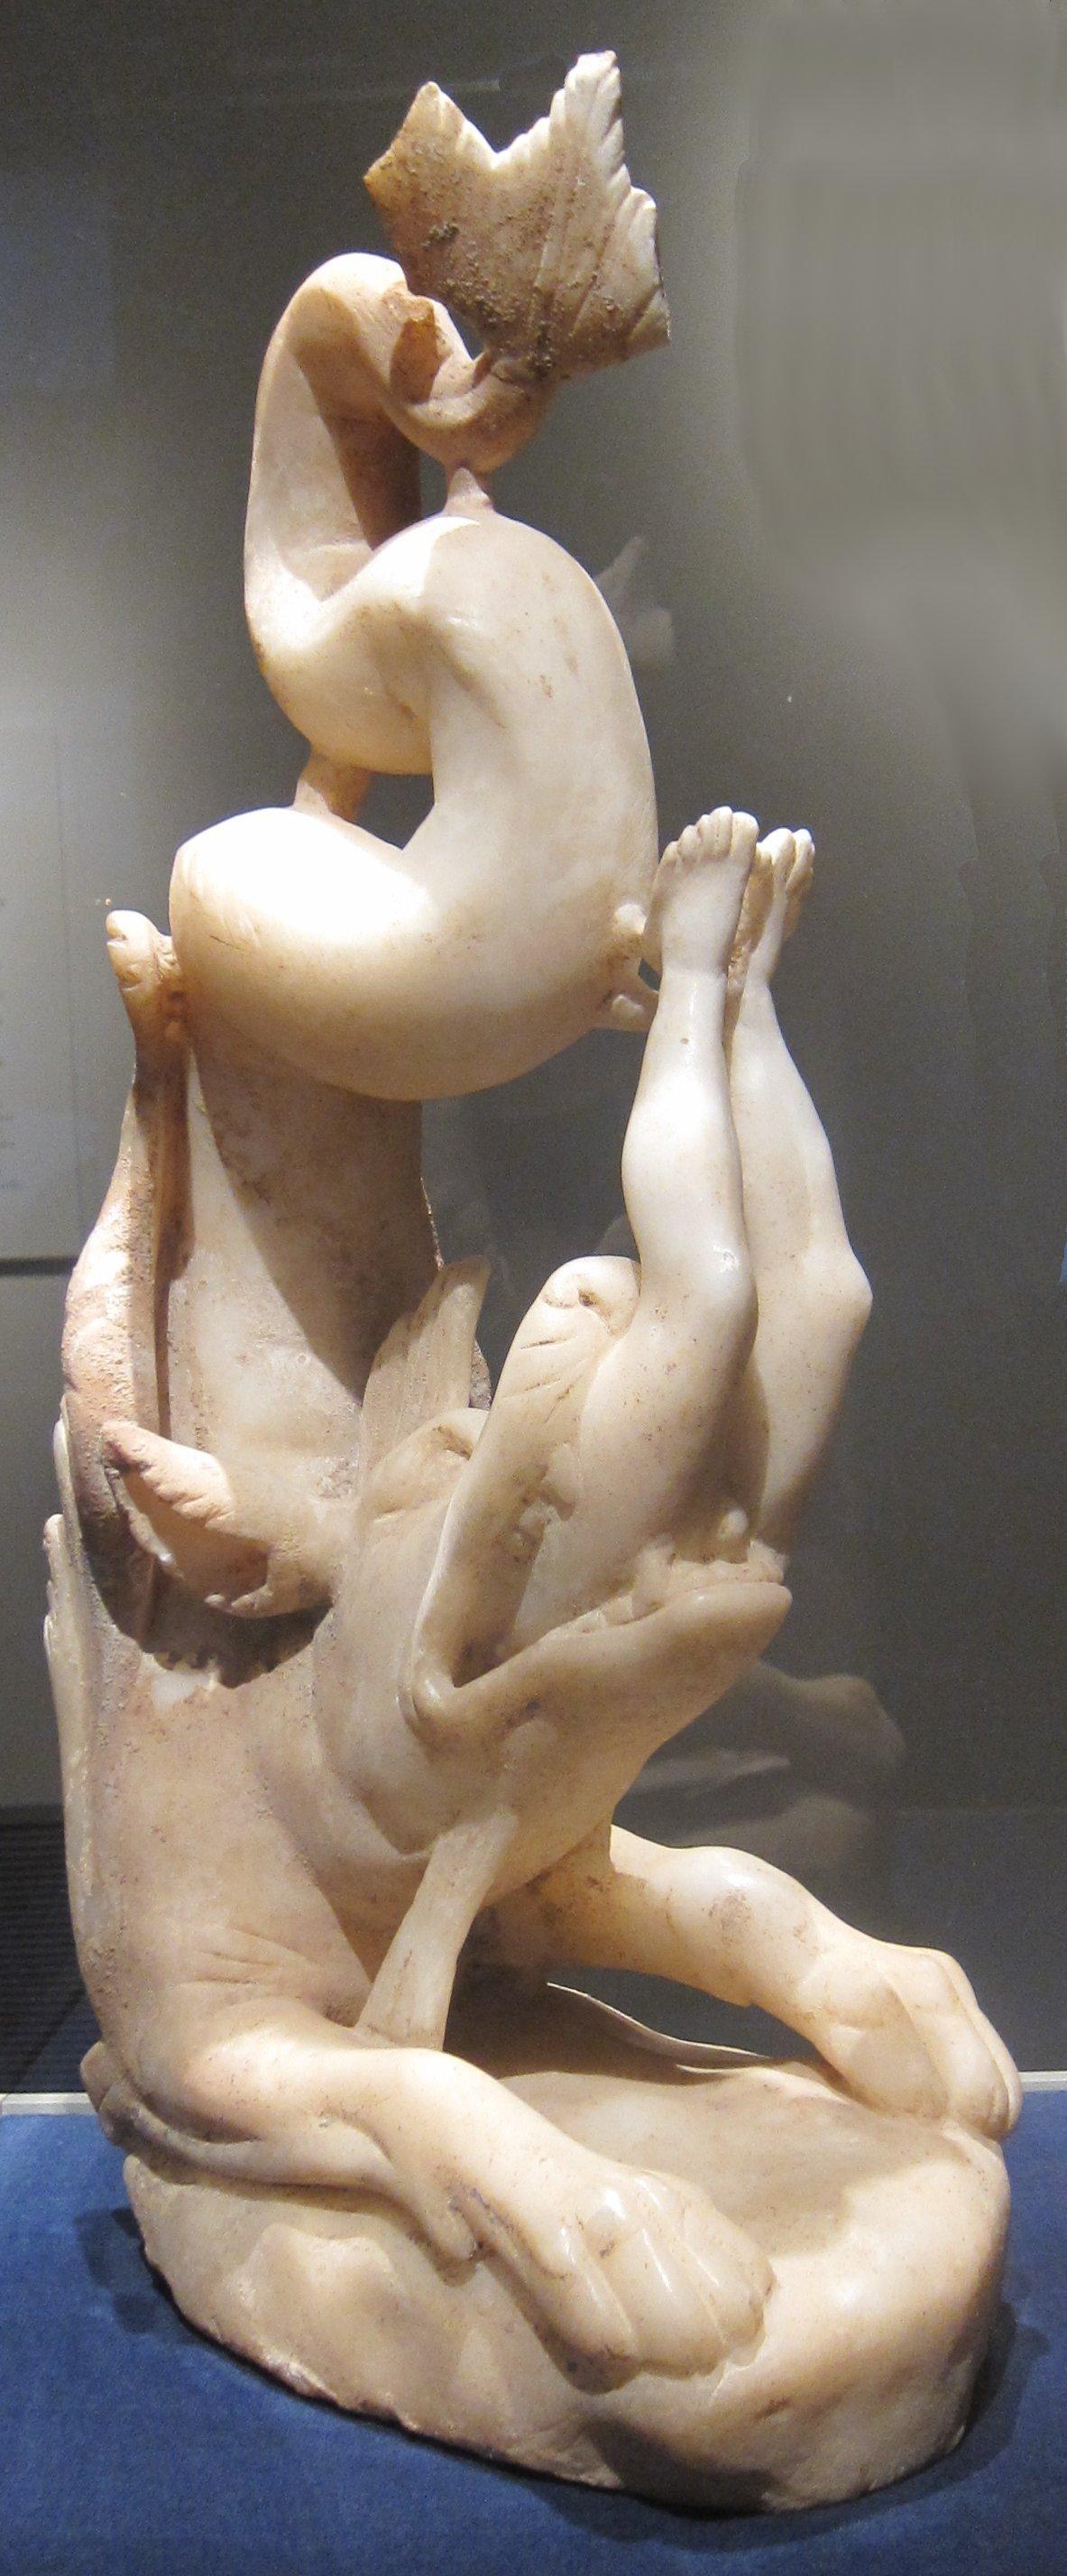 Jonas wird vom Fisch verschluckt, um 280–290, Cleveland Museum of Art